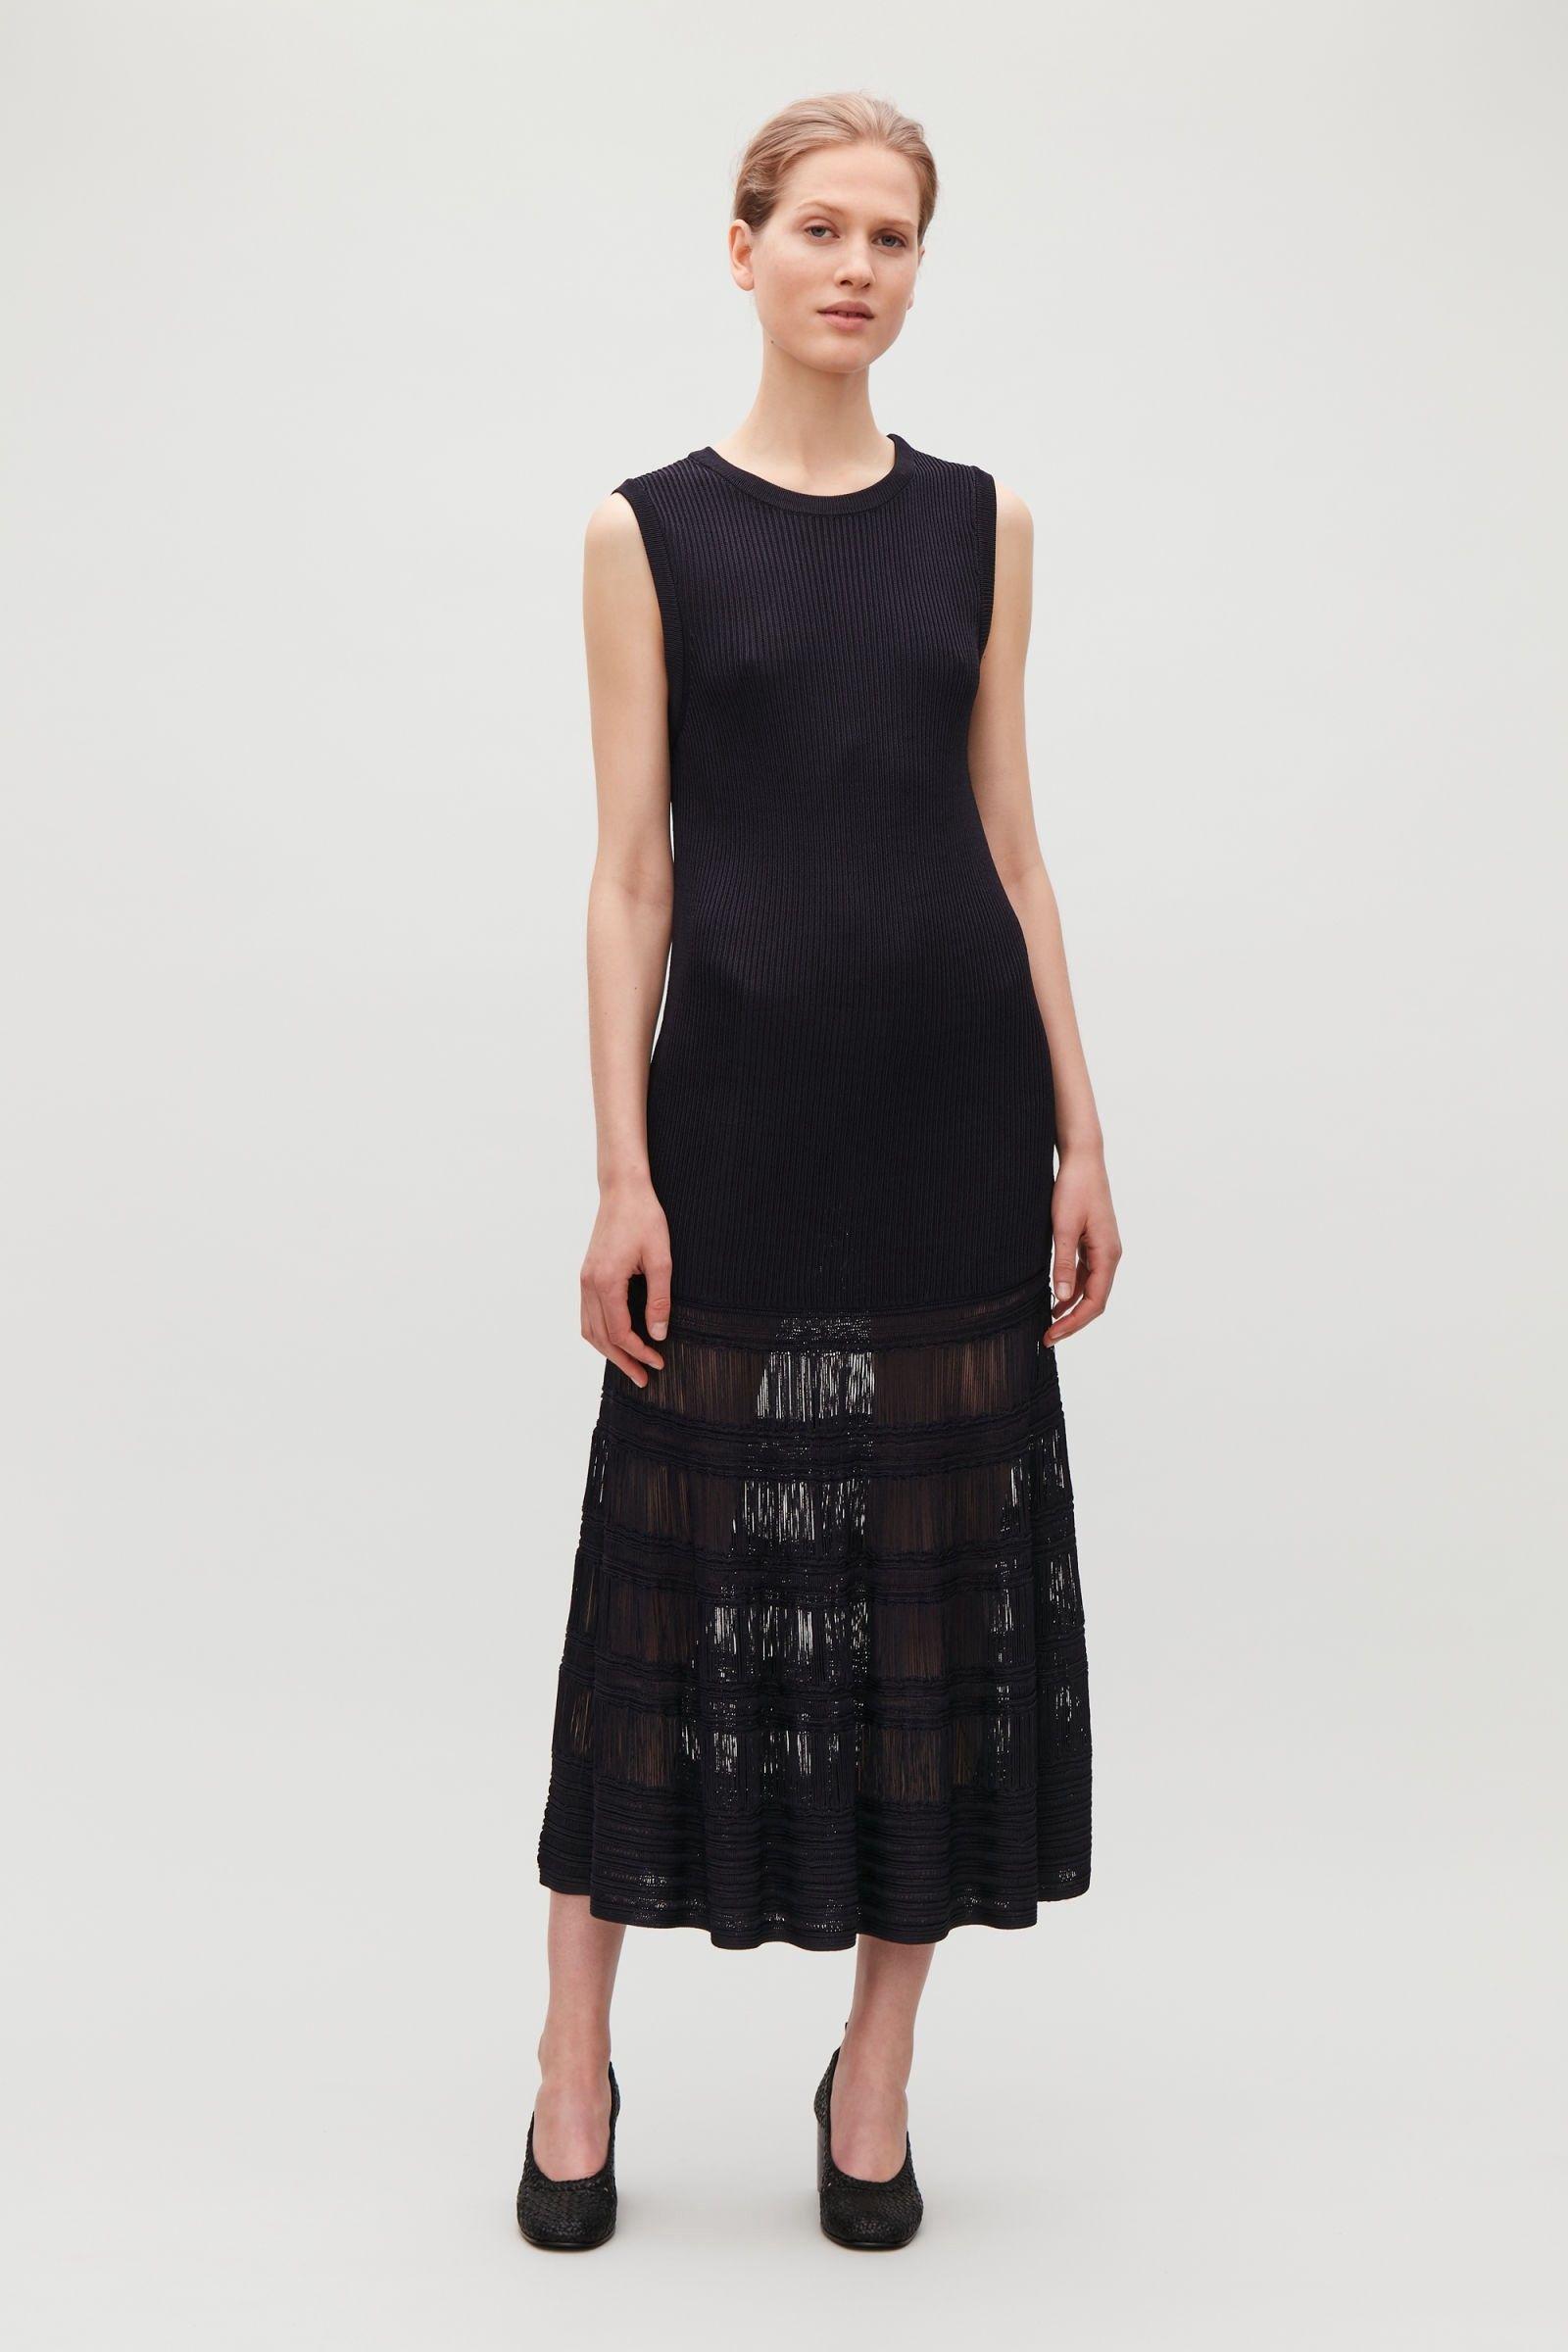 690134b10d7f Cos Long Laddered Knit Dress - Midnight Blue XS   Products   Dresses ...